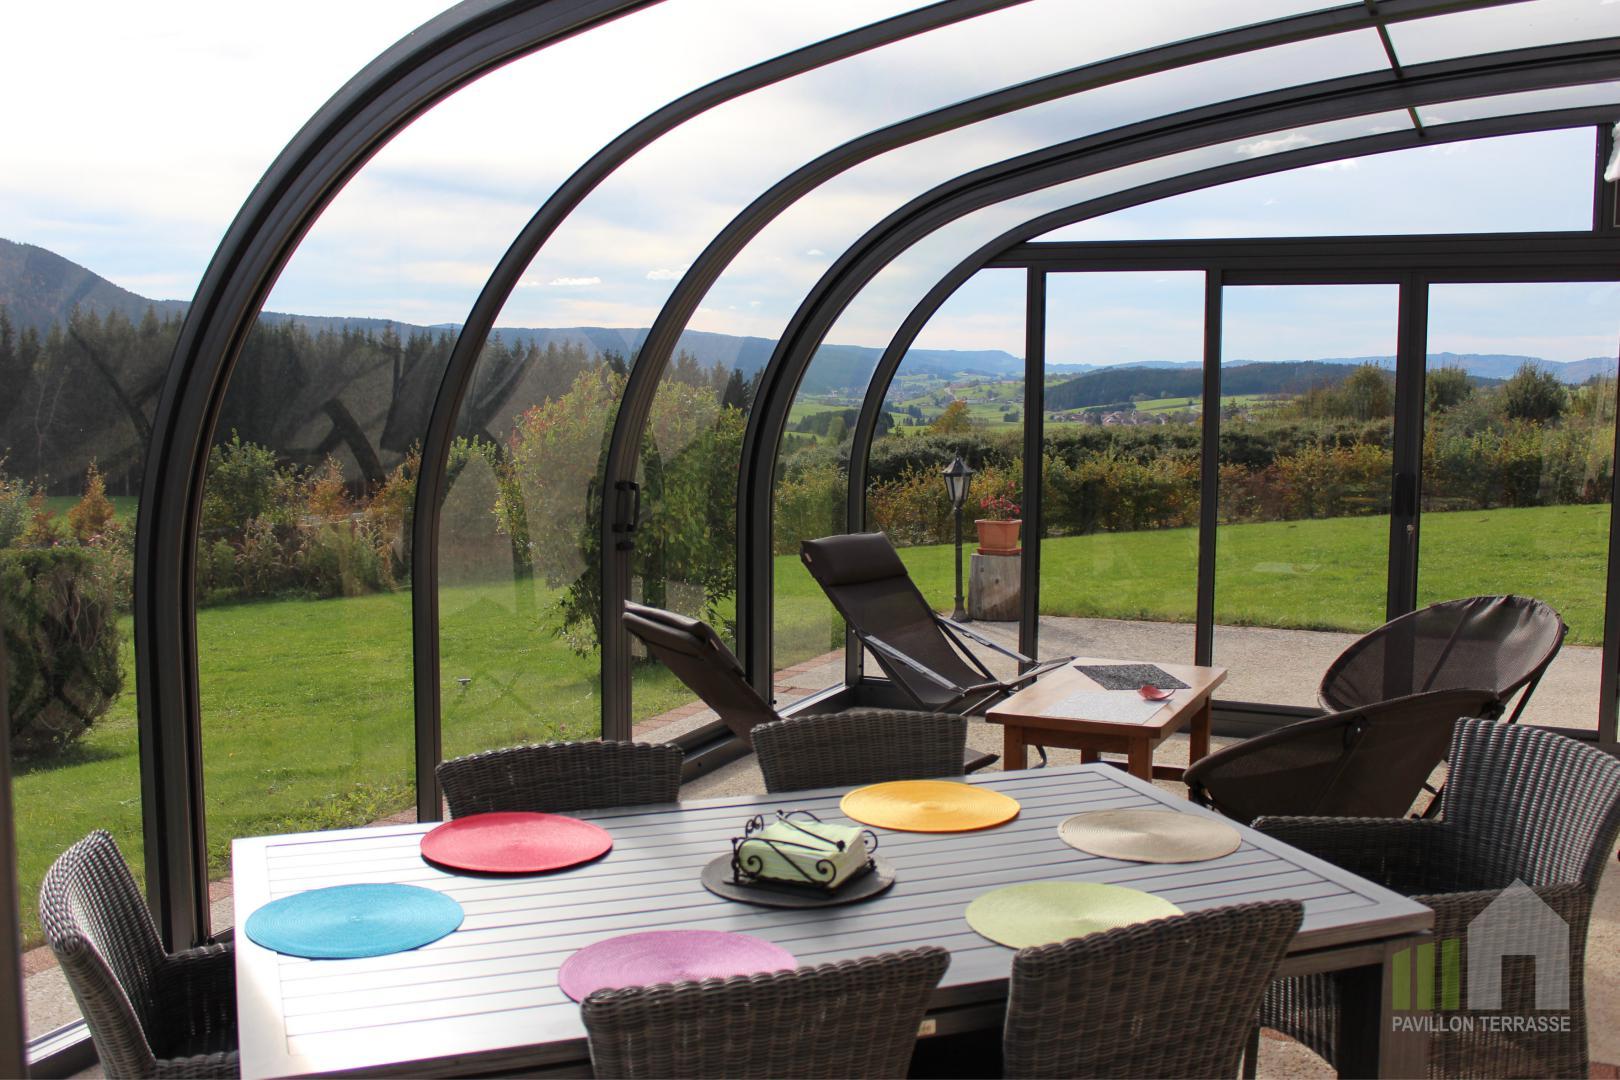 Abris terrasse pavillon i solar v randa coulissante mobile for Abri de terrasse prix